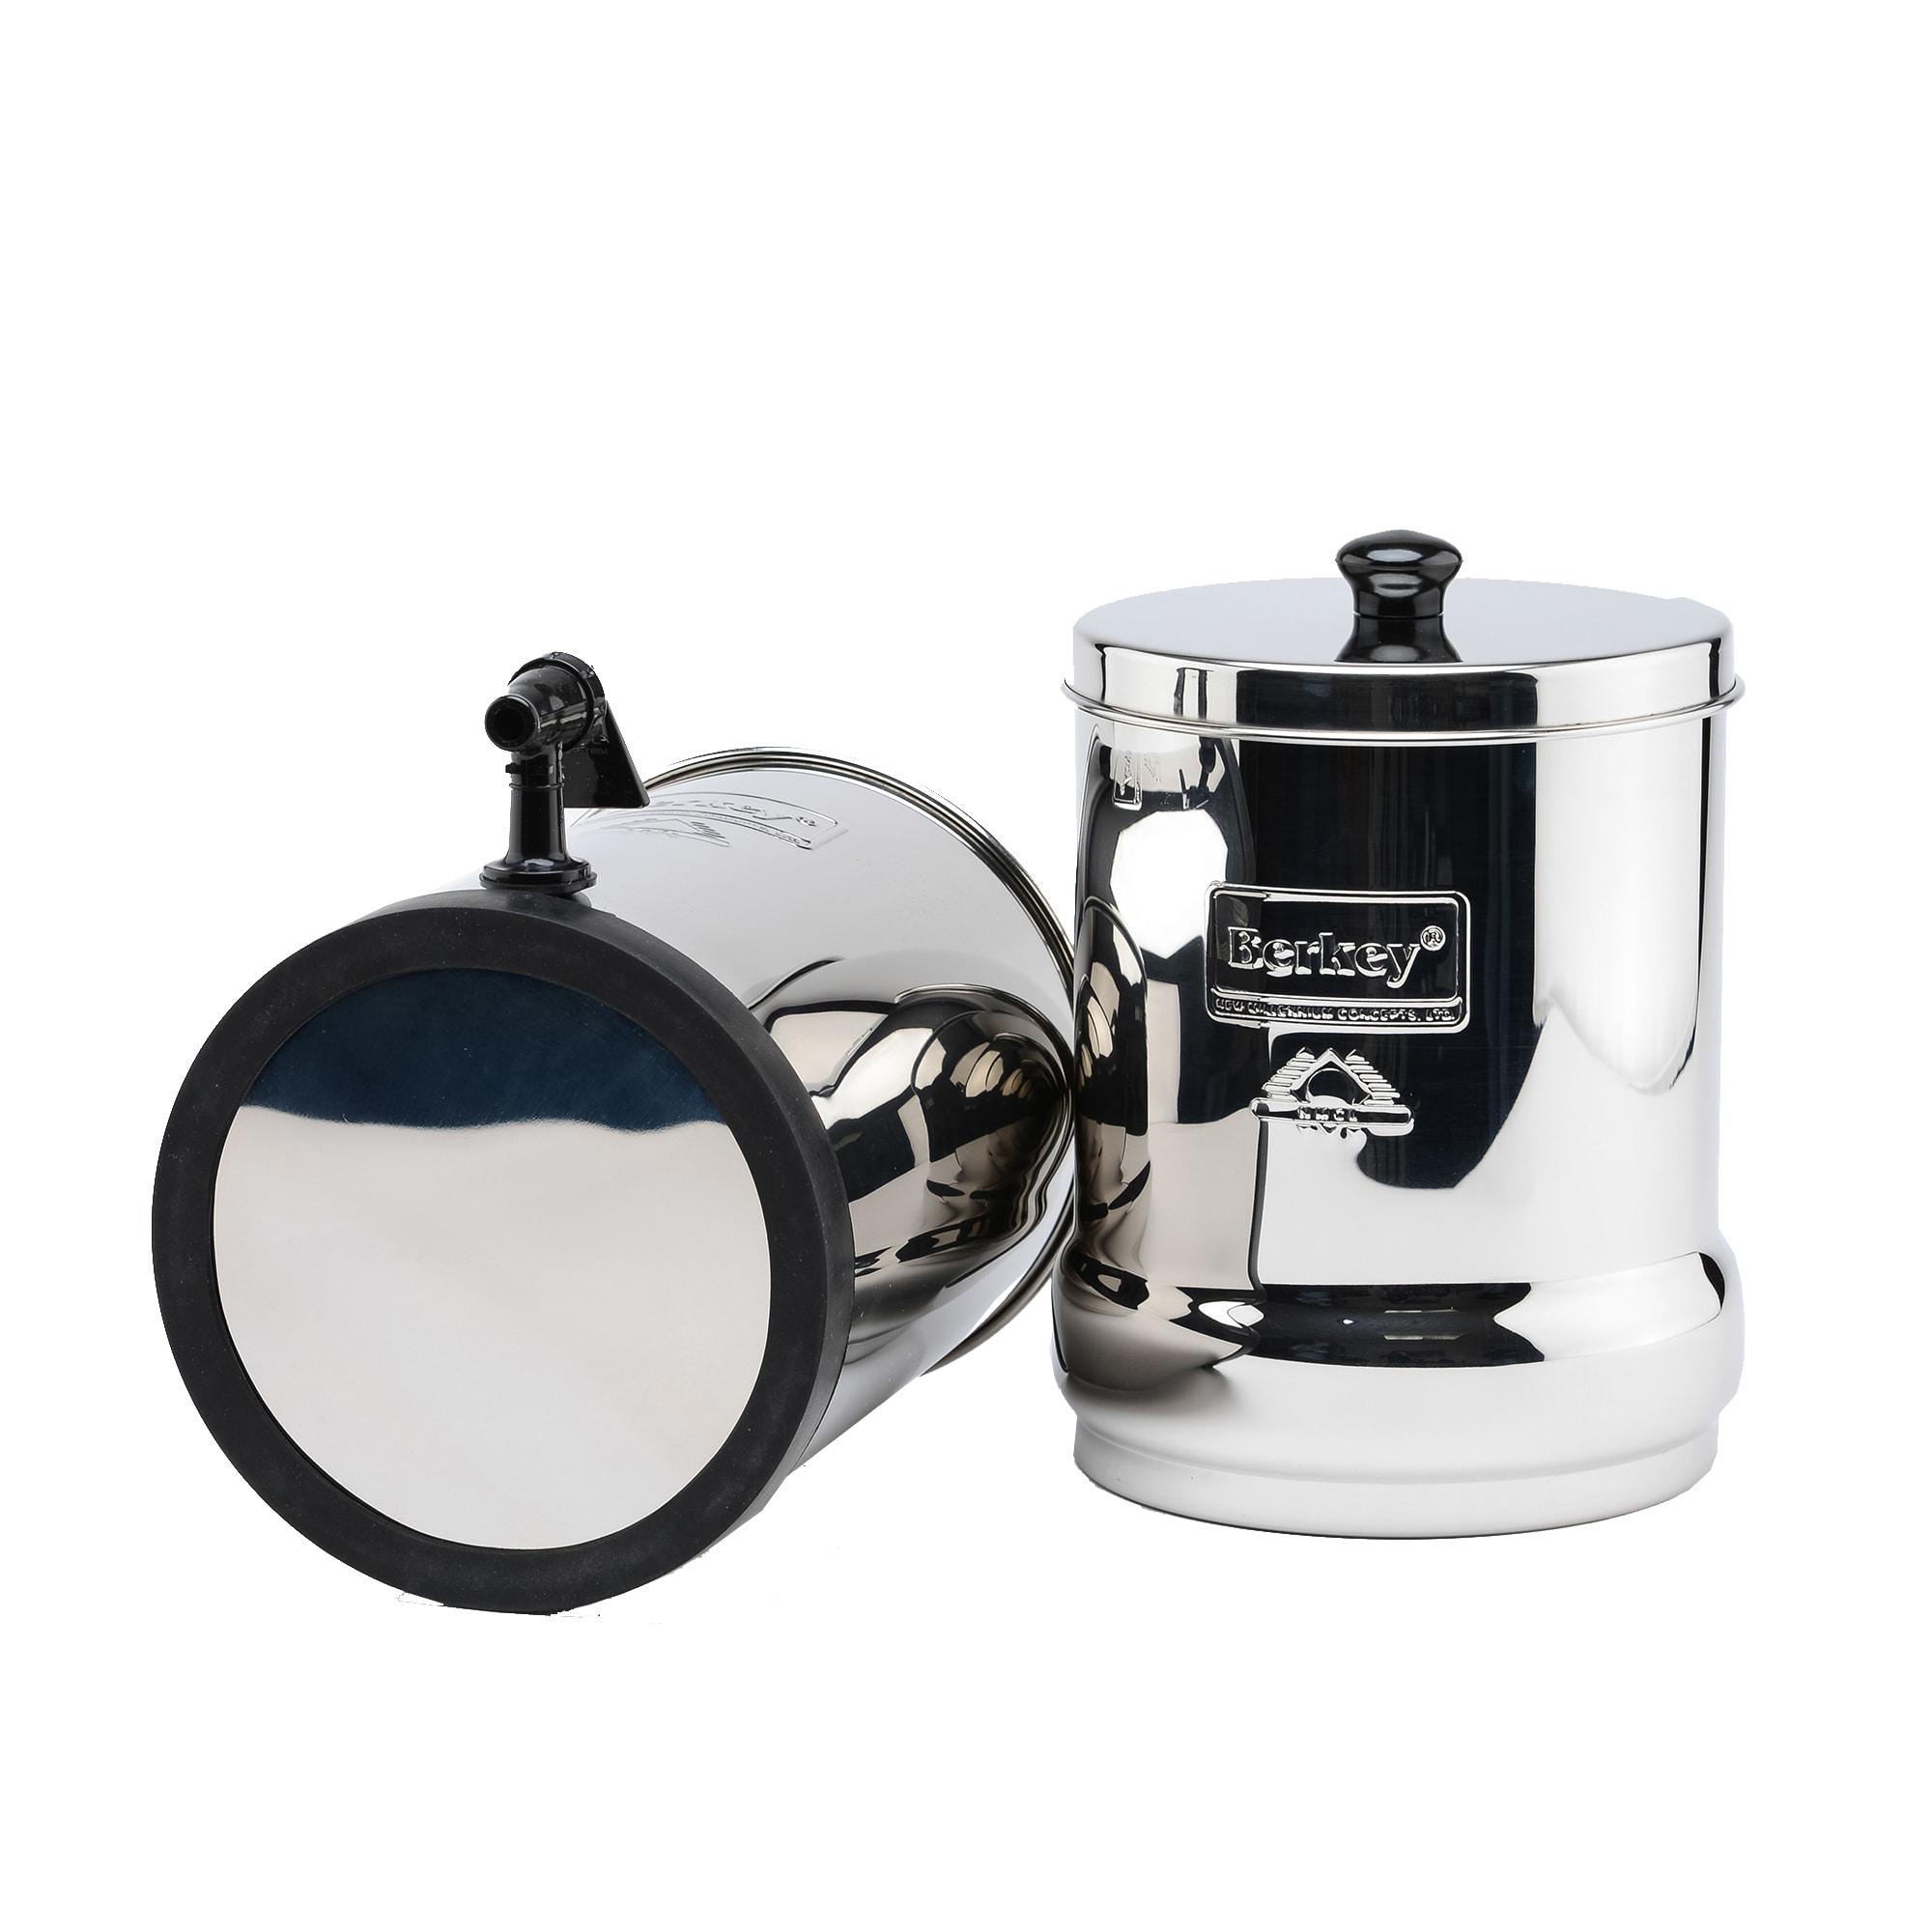 Travel Berkey Waterfilter Systeem Berkey Water Filters